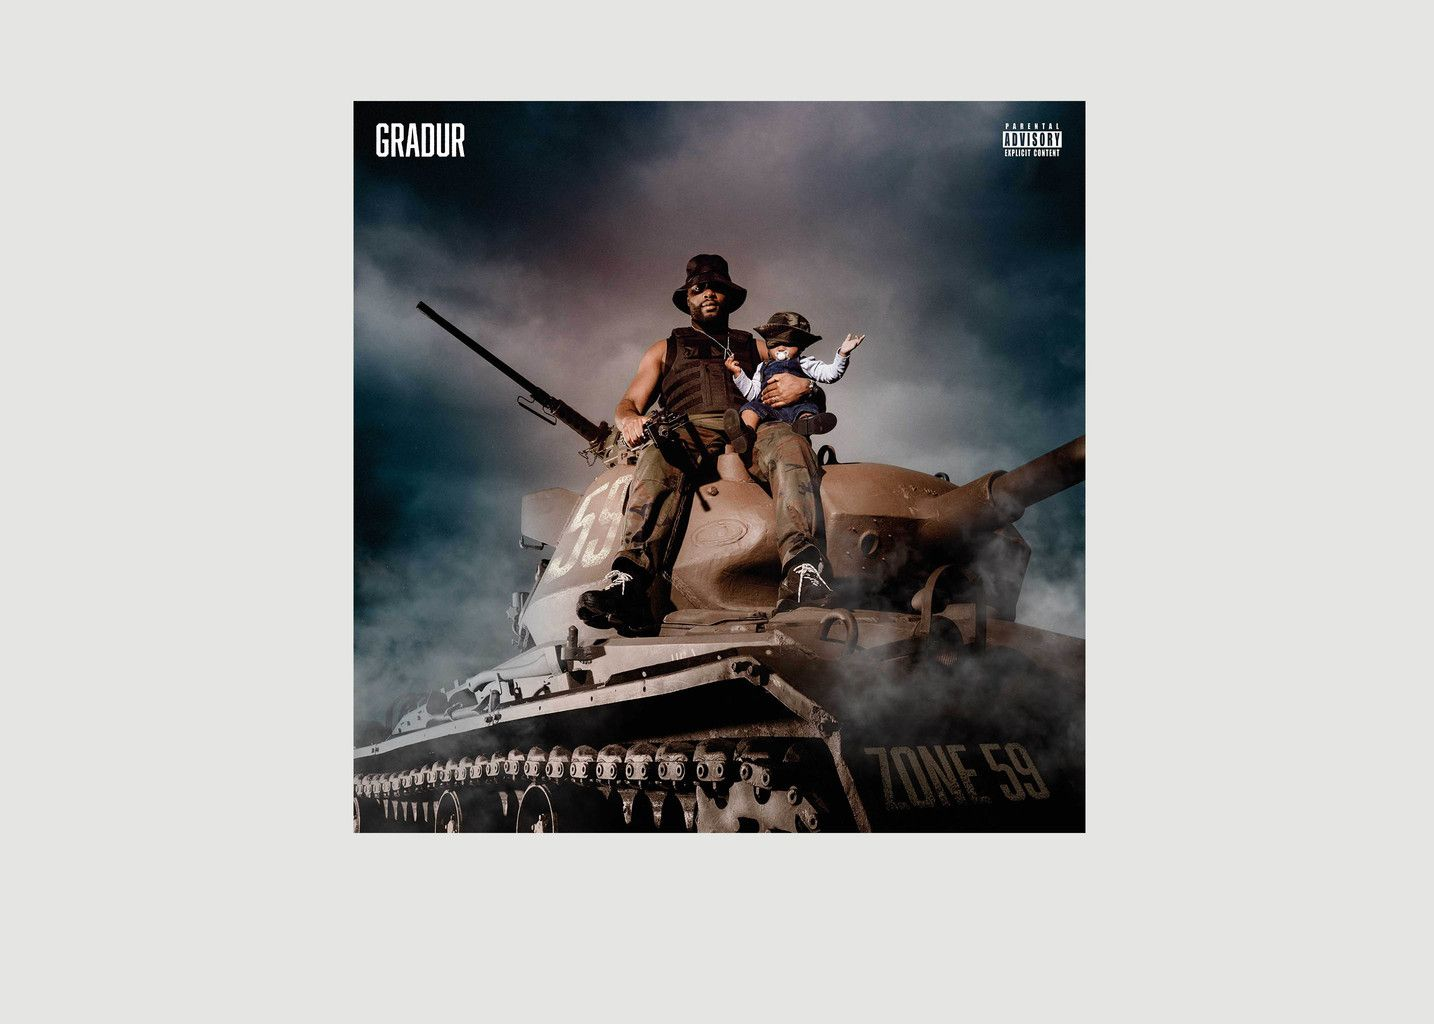 Zone 59 - Gradur - La vinyl-thèque idéale